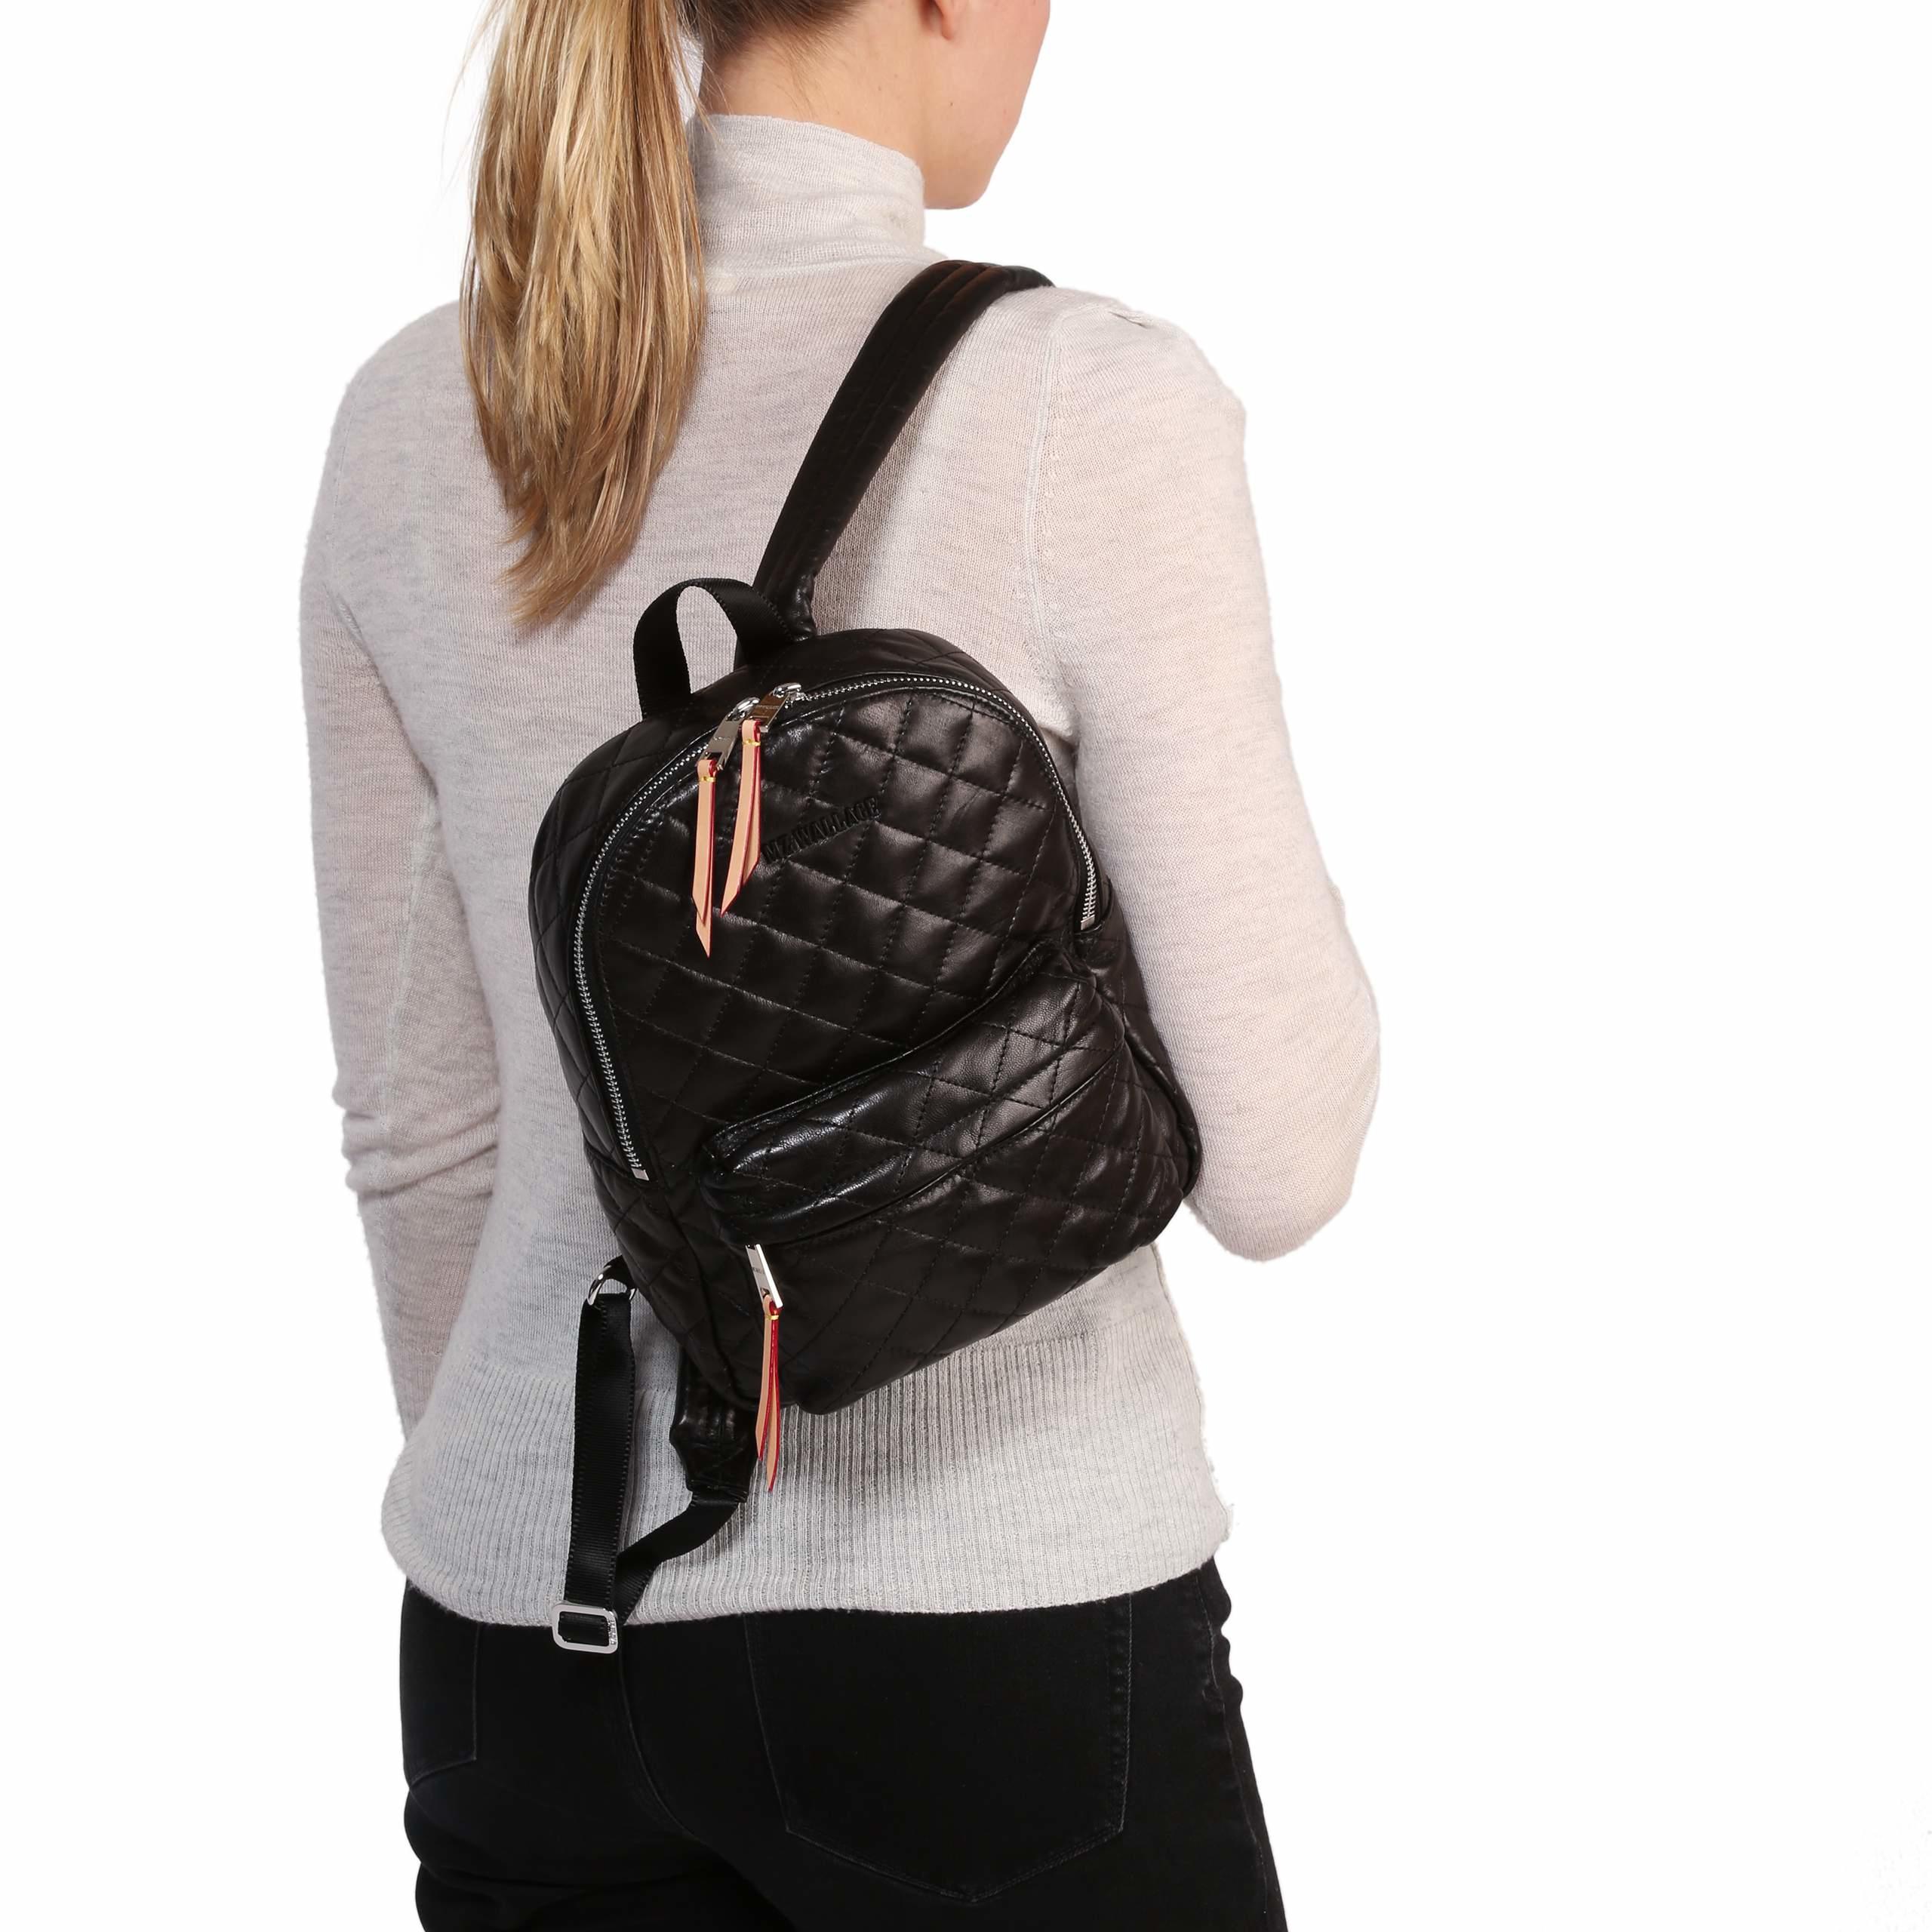 4c45867d4db0 MZ Wallace Metro Backpack - Black in Black - Lyst